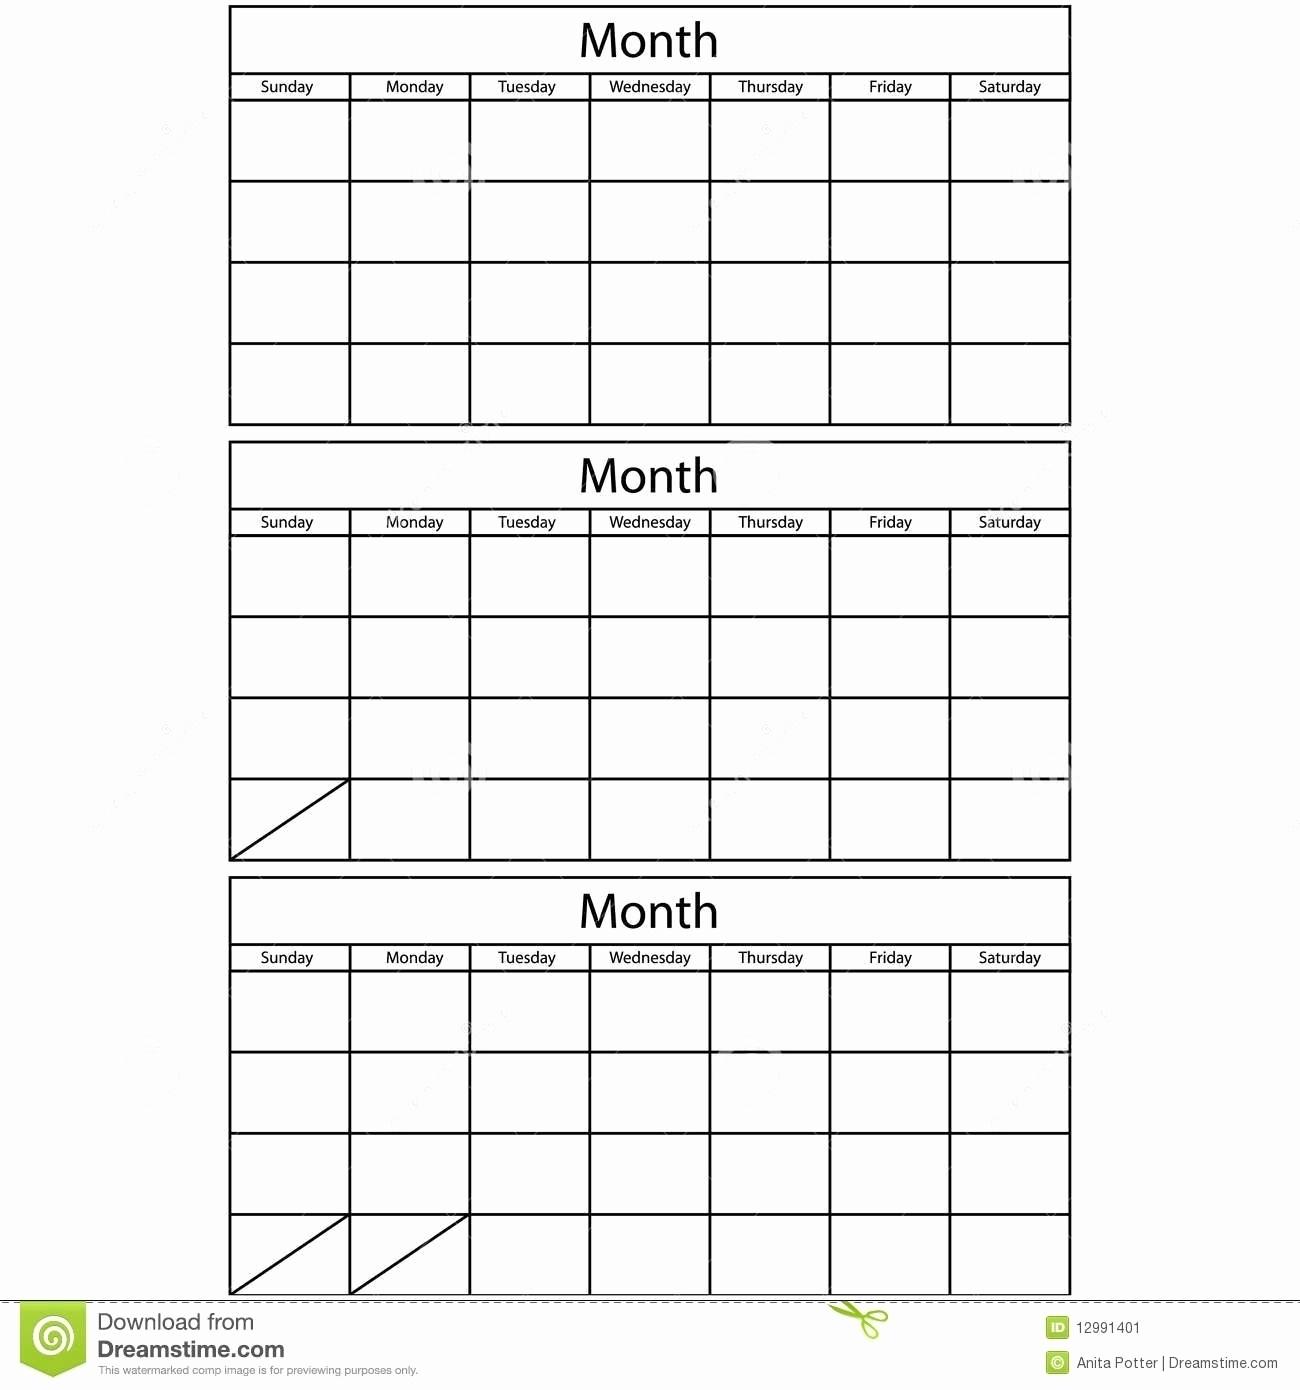 Printable 3 Month Calendar | Example Calendar Printable intended for 3 Month Blank Calendar Template